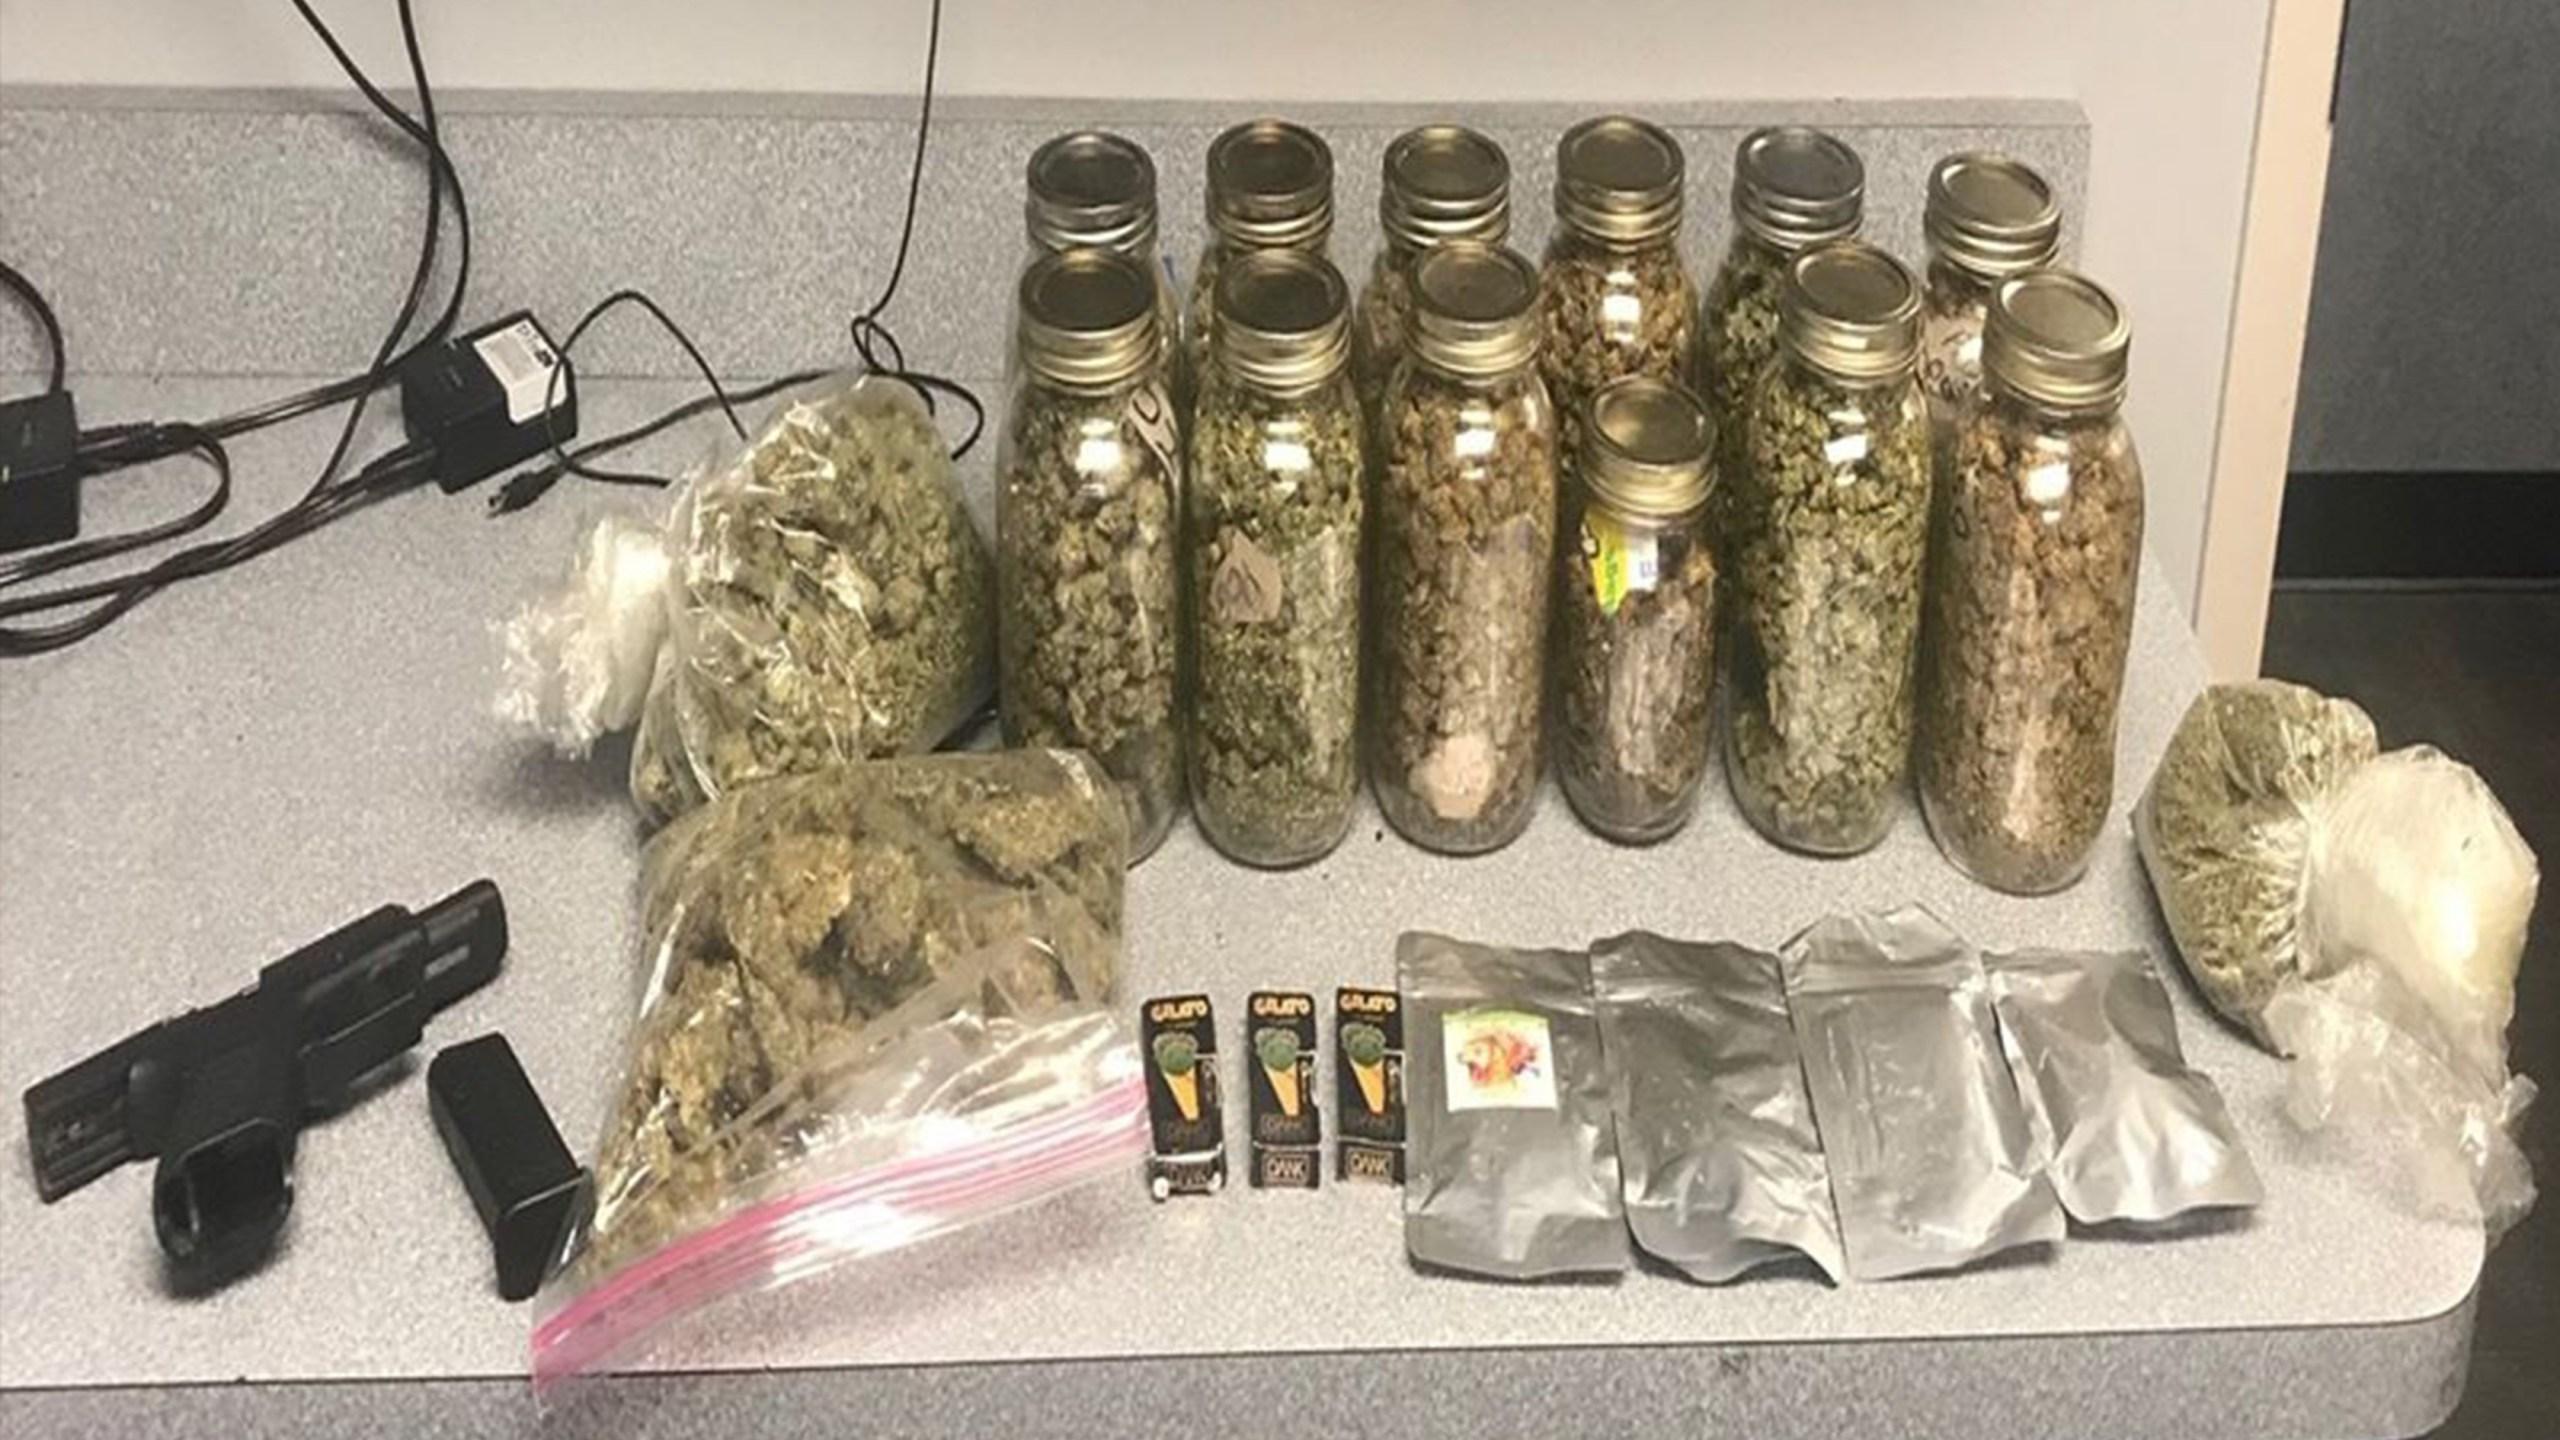 Marijuana seized in Moraine